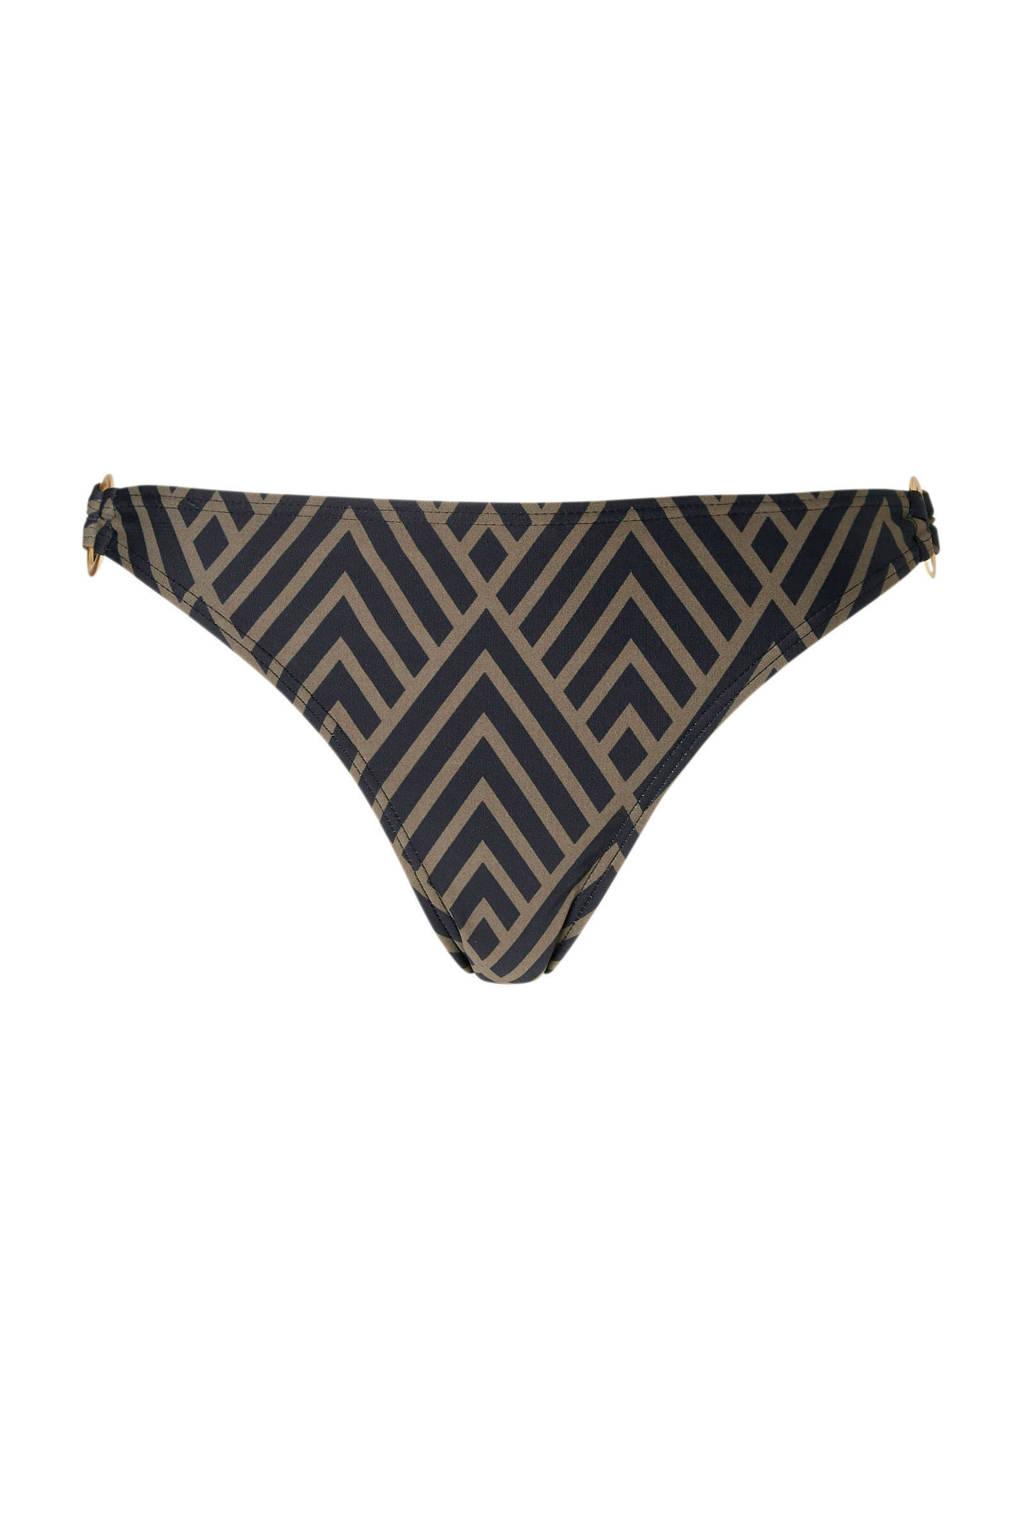 whkmp's beachwave Mix & Match bikinibroekje gevoerd in all over print zwart, Zwart/taupe